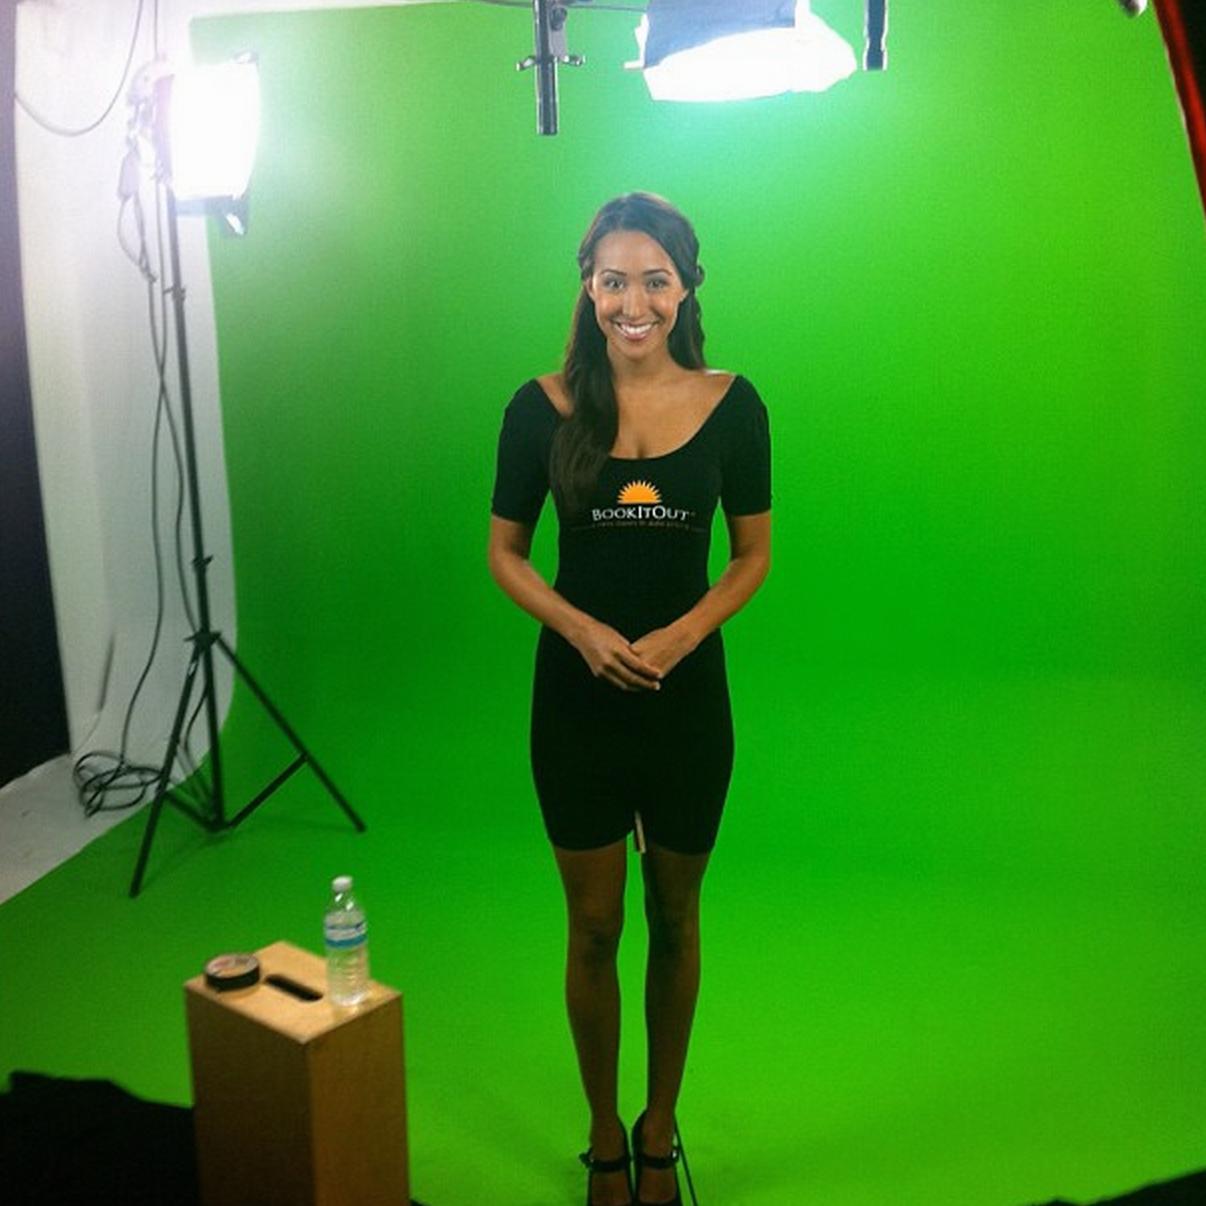 inc awarded boldest company of dealer 2011 tv interview 3 photos